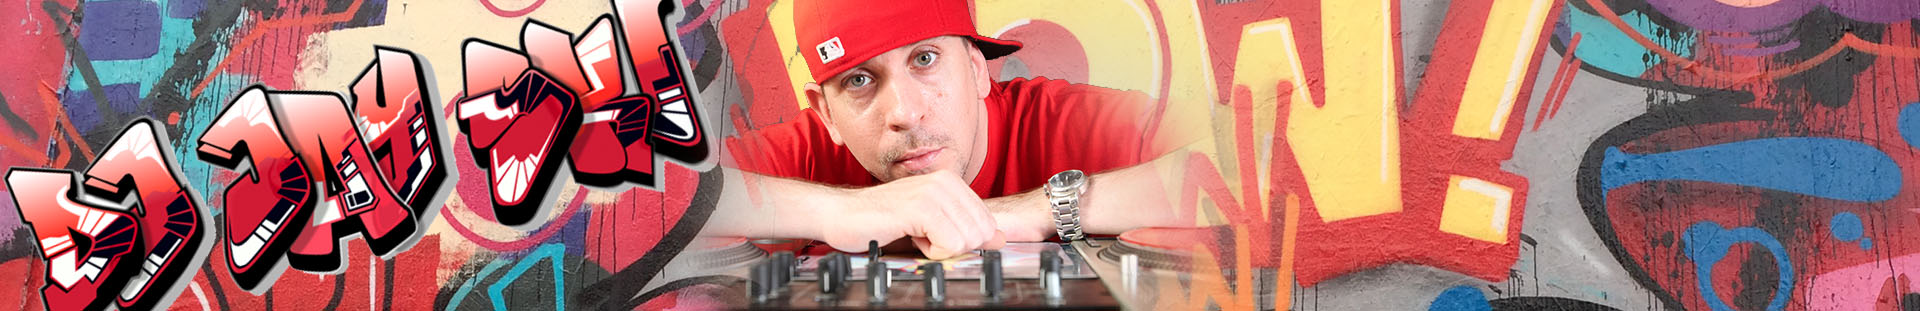 boom-philly-jay-ski-hip-hop-radio